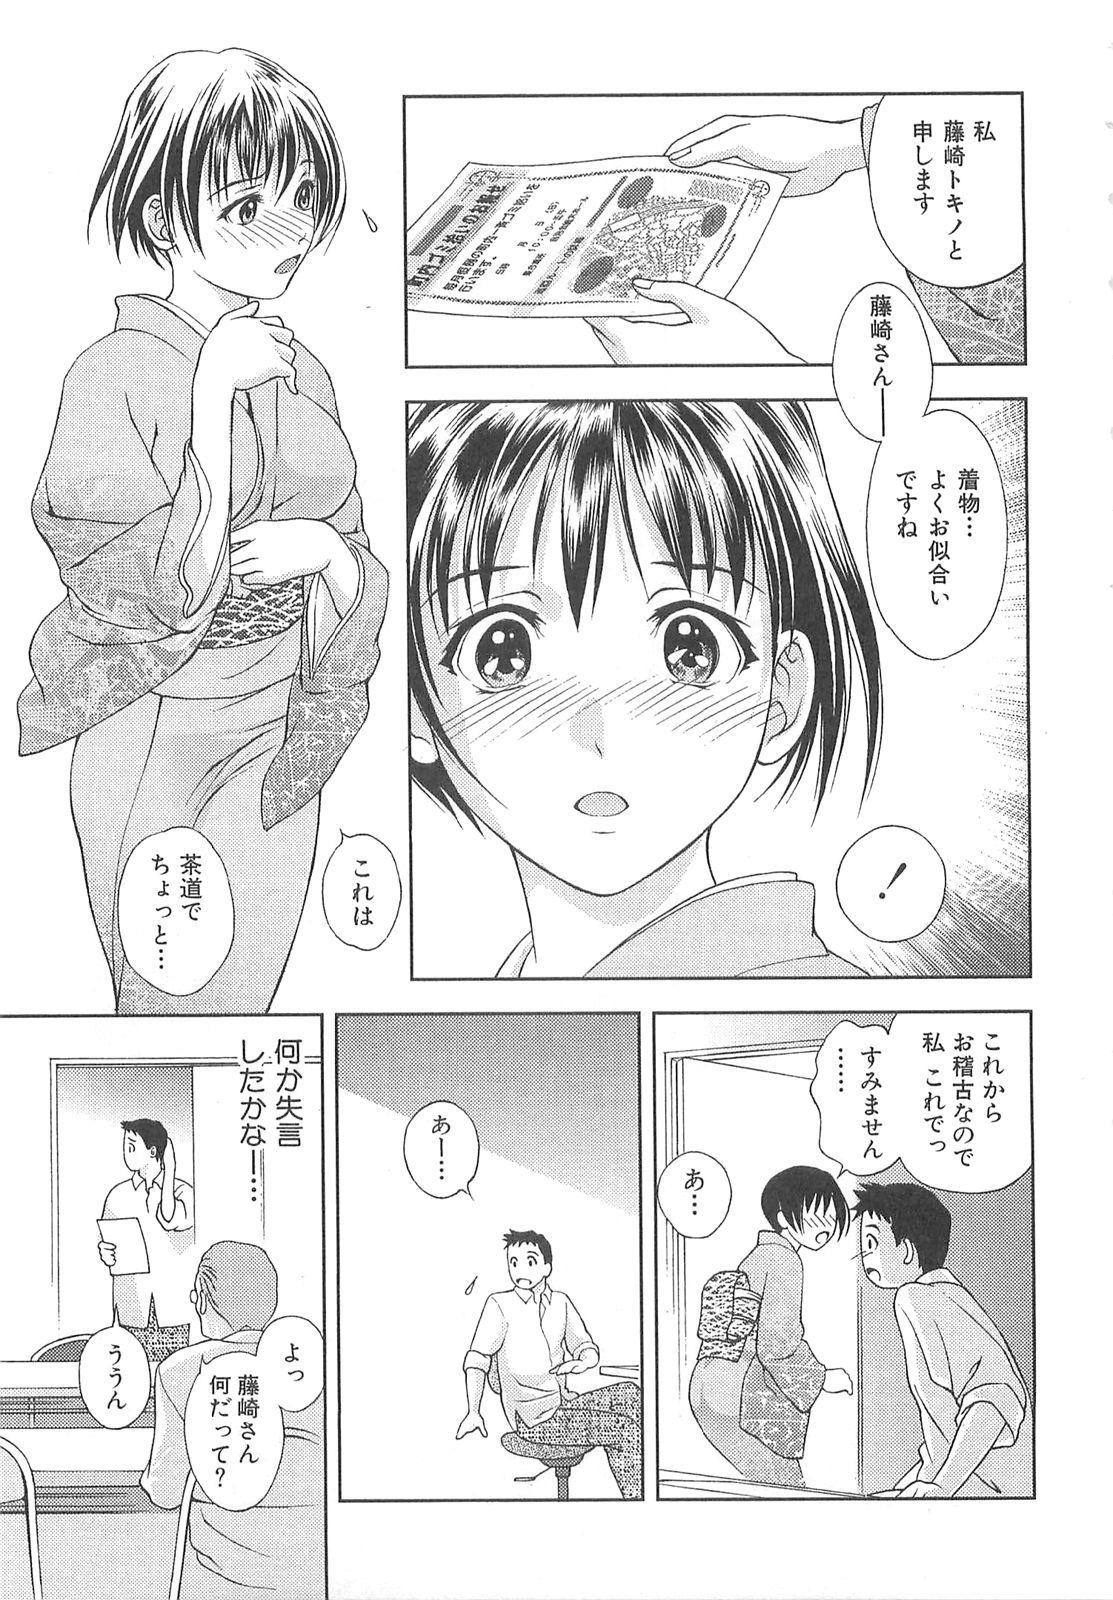 Tenshi no Kyuu - Angel's Pretty Hip 109